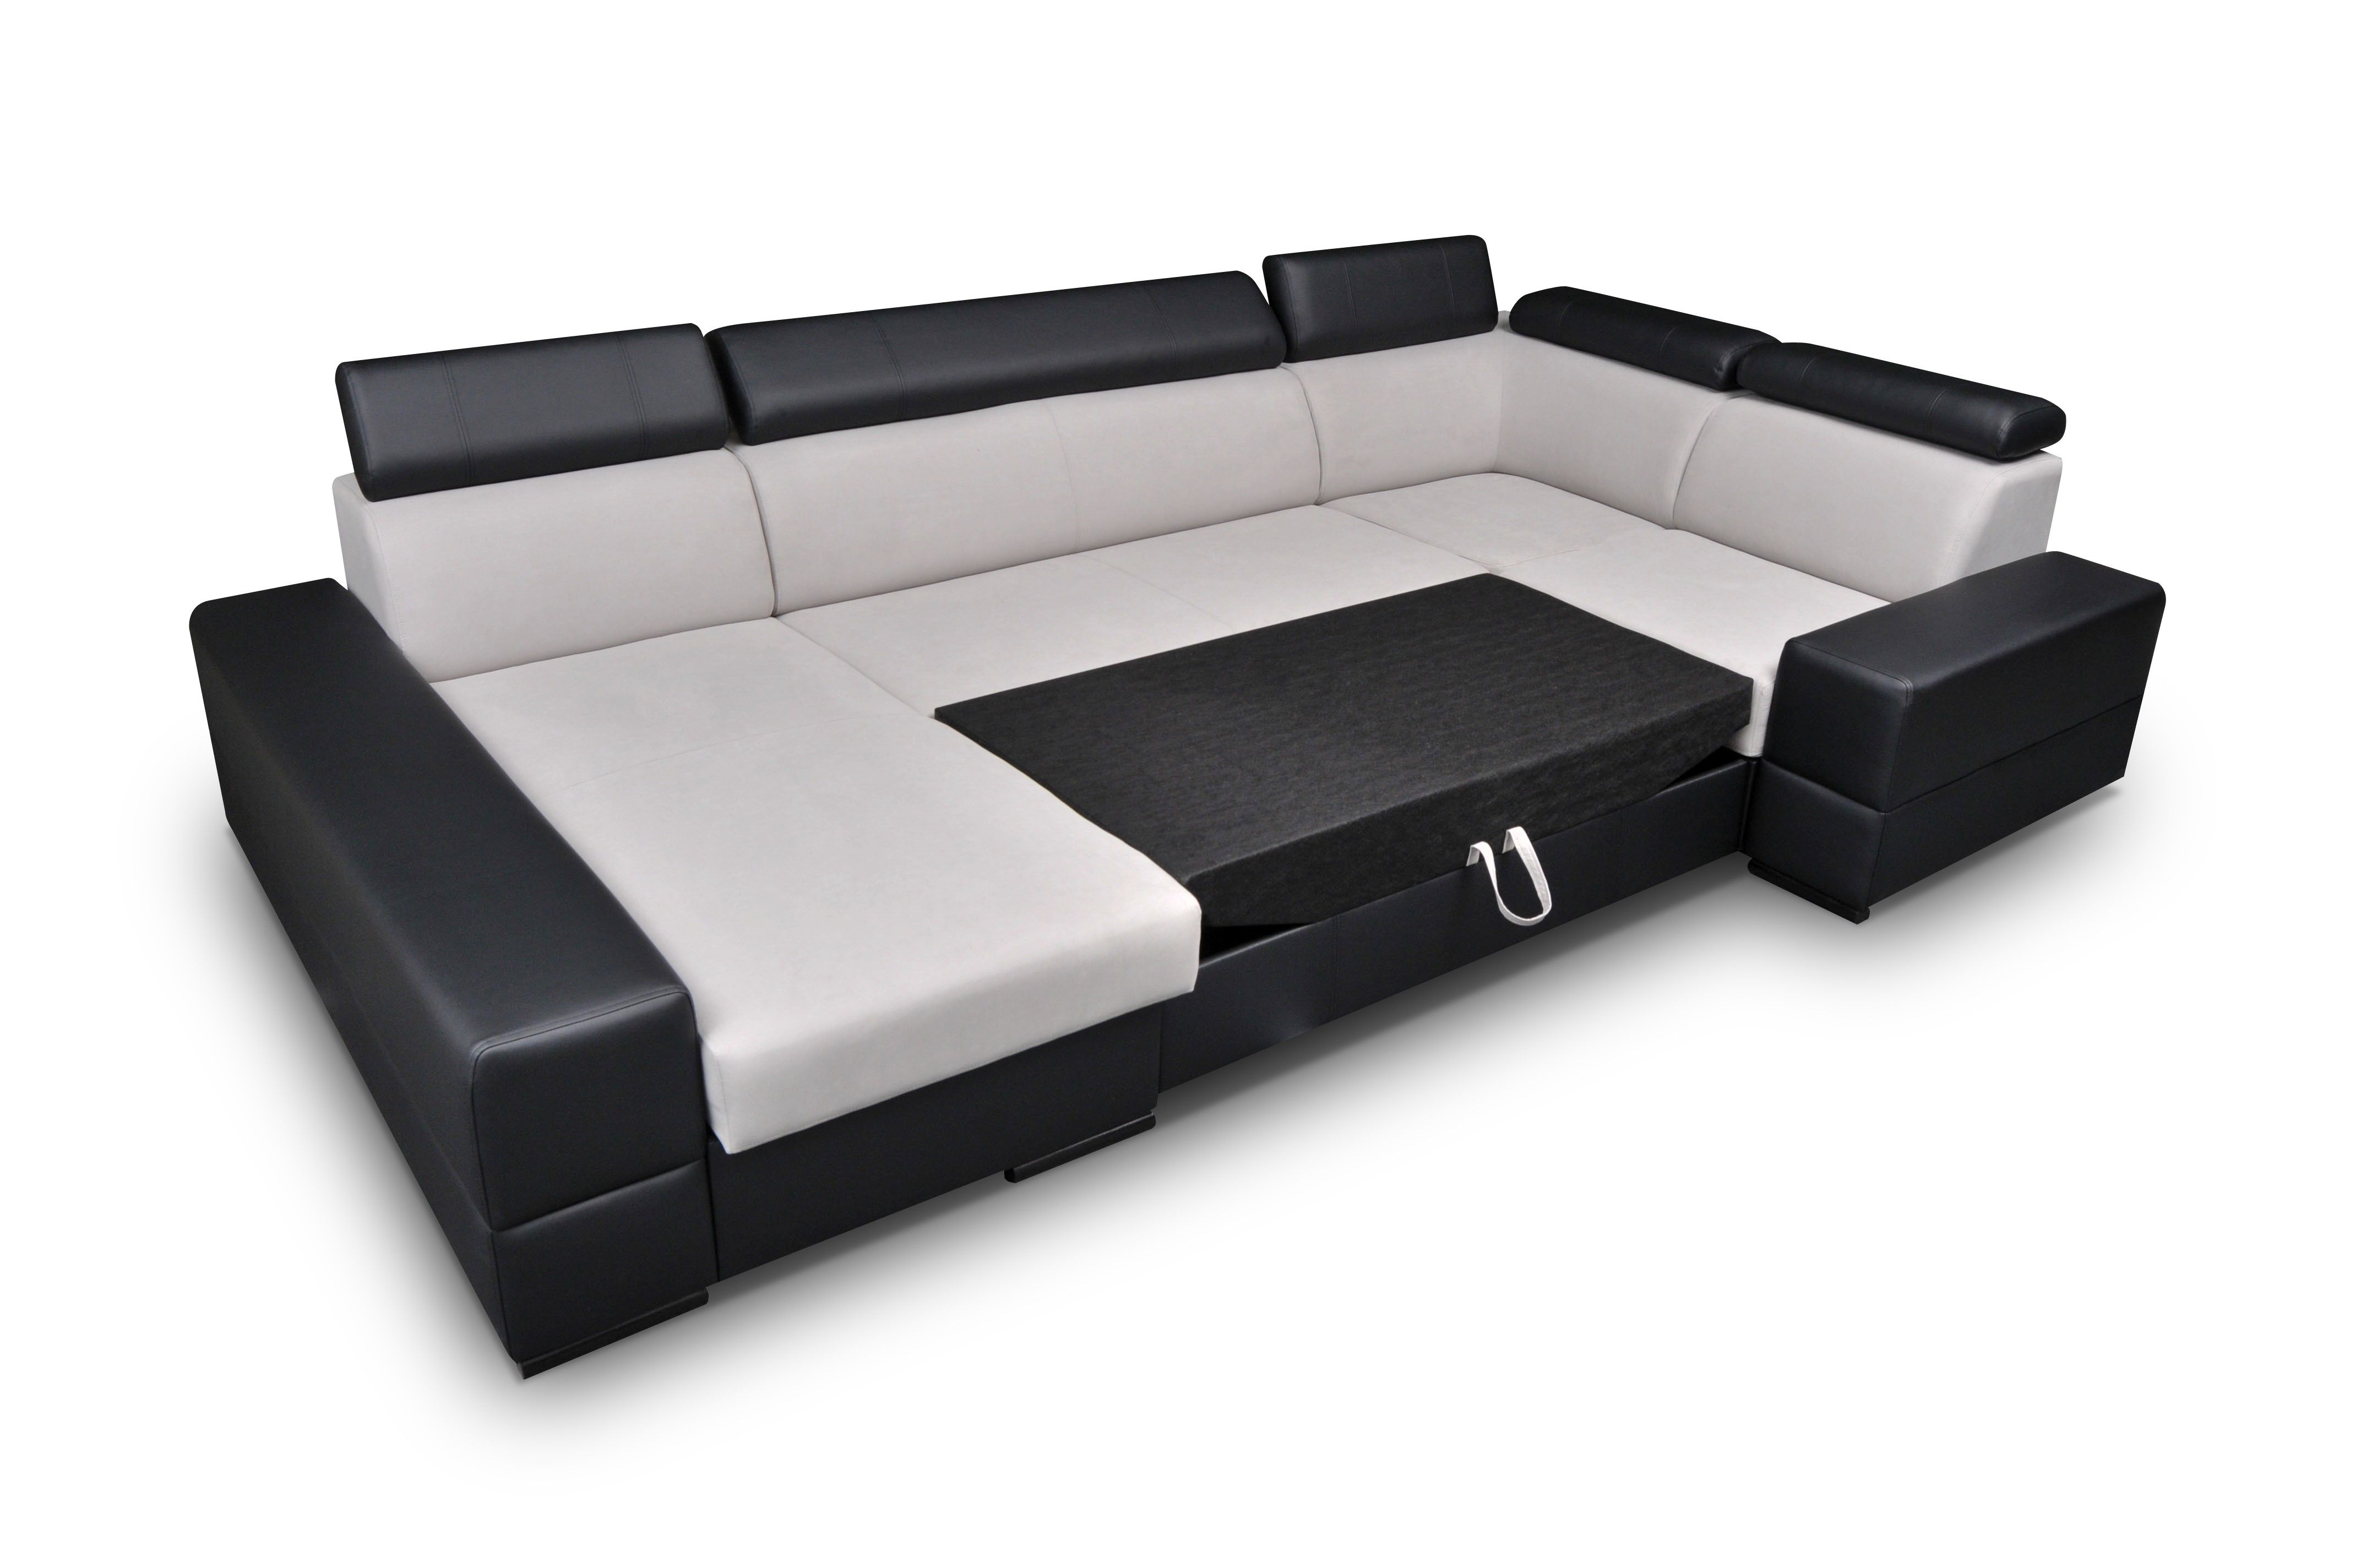 Canapé Convertible D'angle Cawpa Acheter DesignÀ Chloe CBeodxr